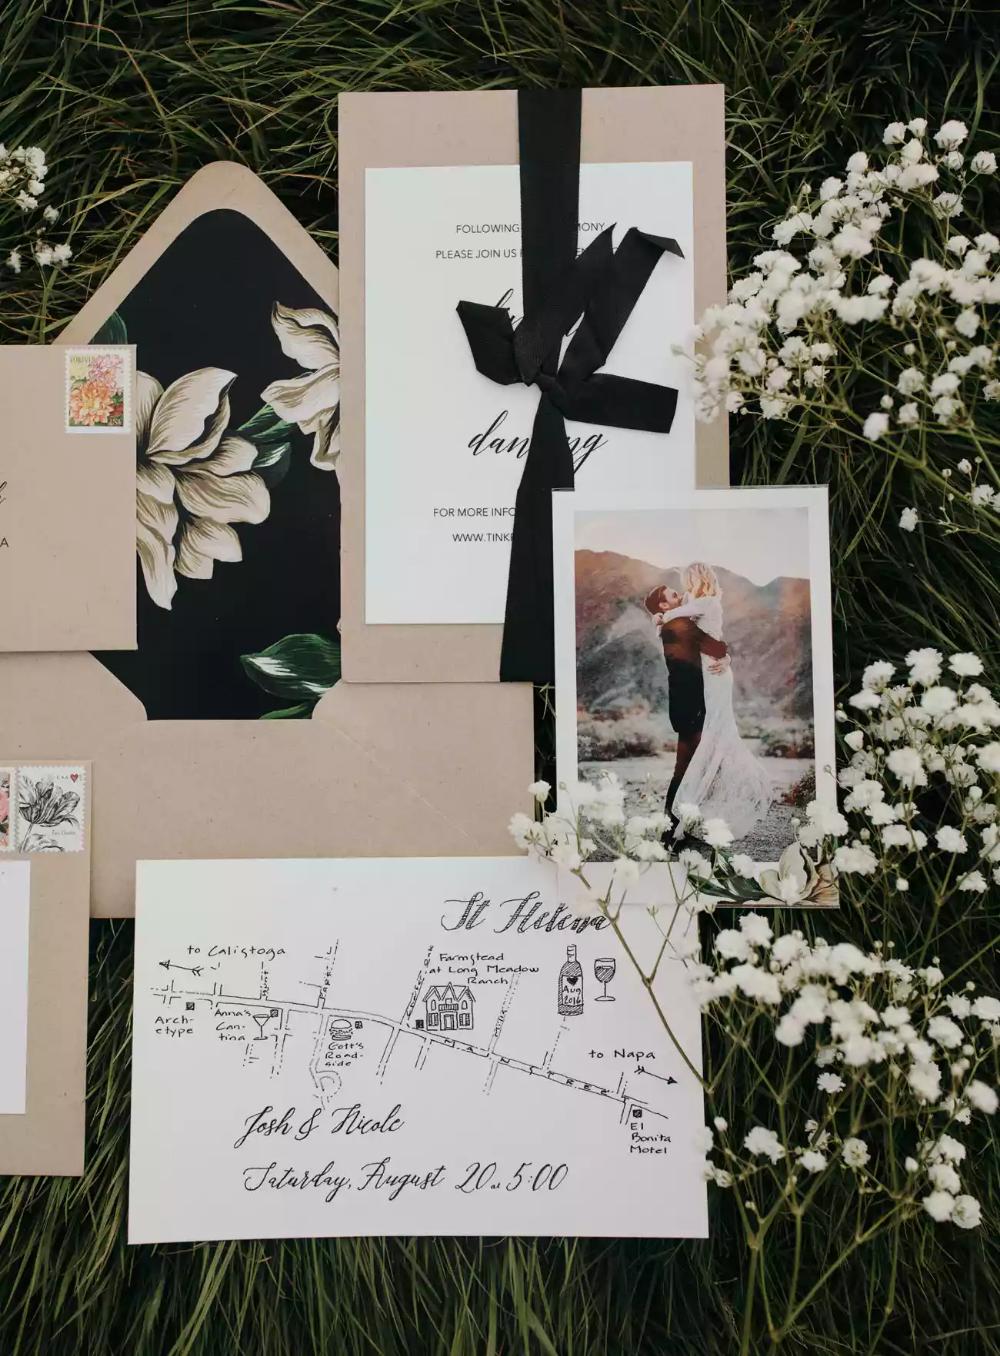 75 Unique Wedding Ideas | Small backyard wedding, Backyard ...